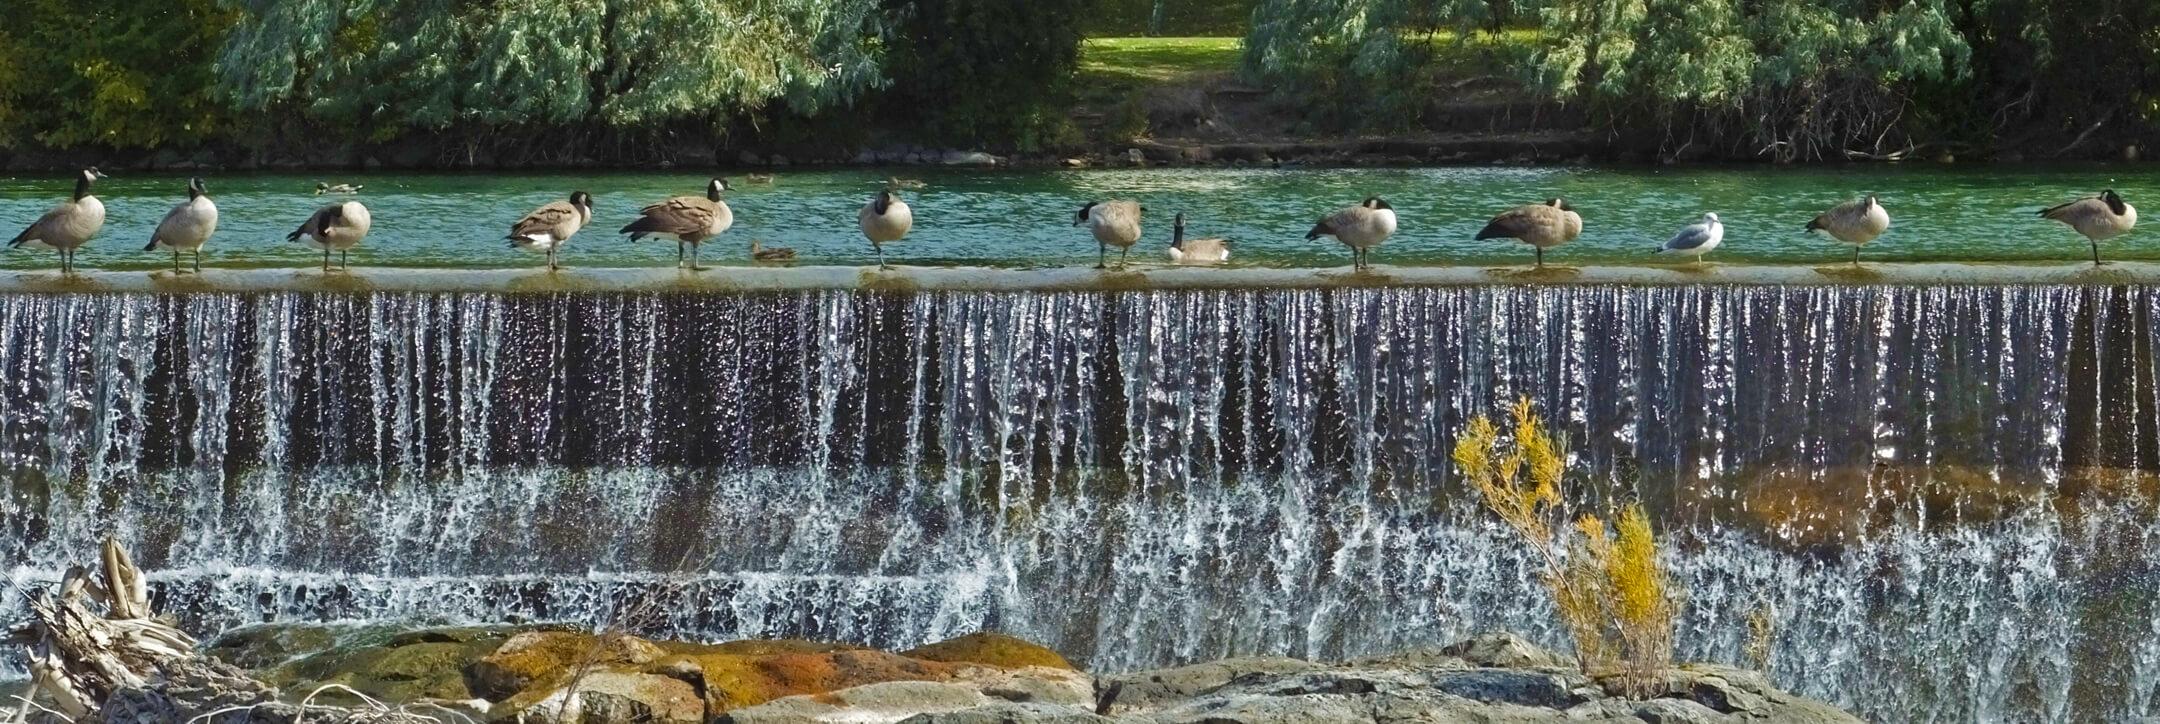 idaho-falls-geese-shield-insurance